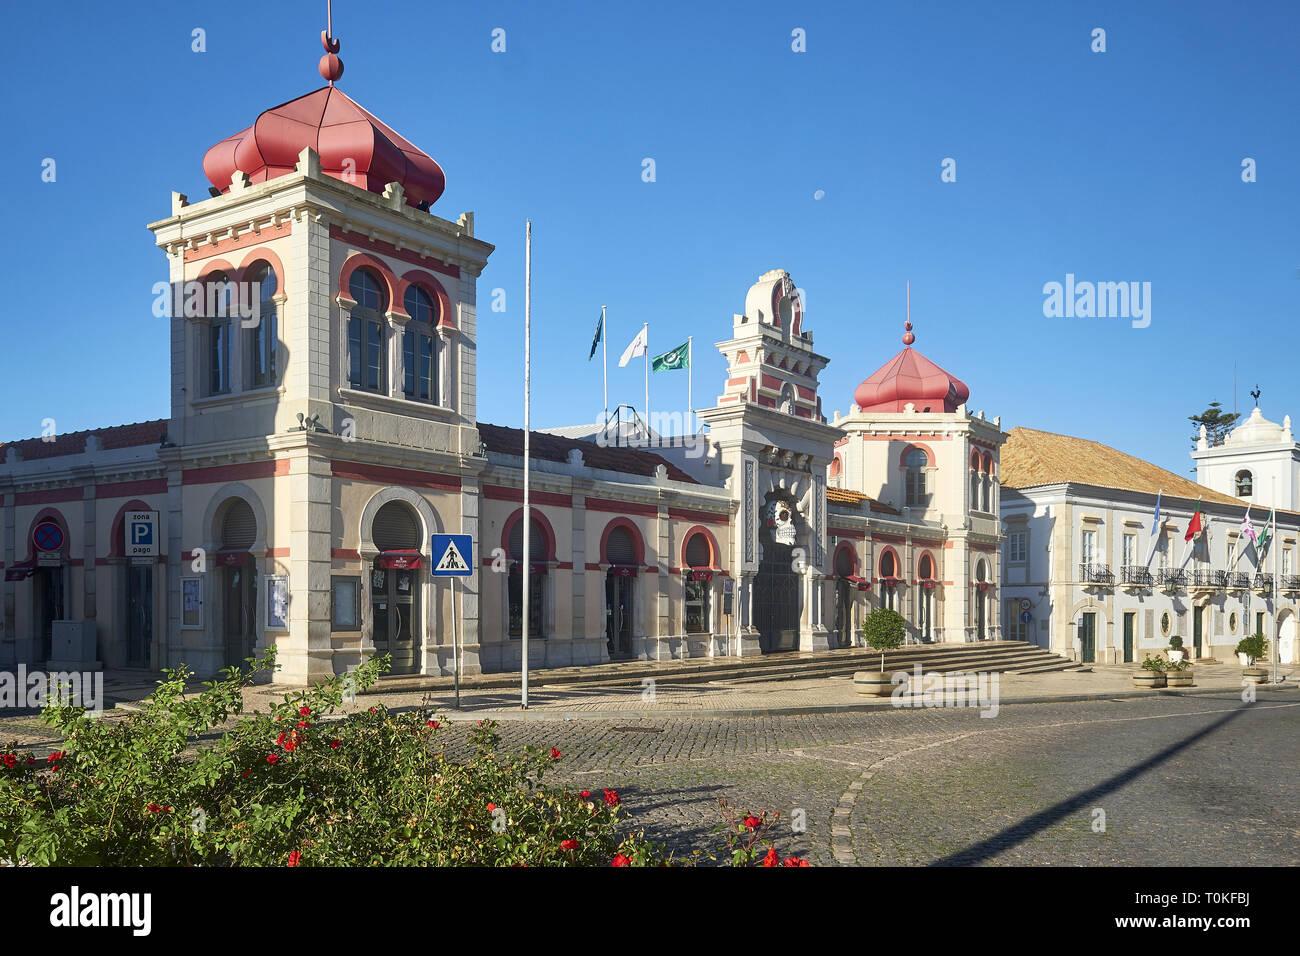 Halle de Albufeira, Faro, Algarve, Portugal Banque D'Images